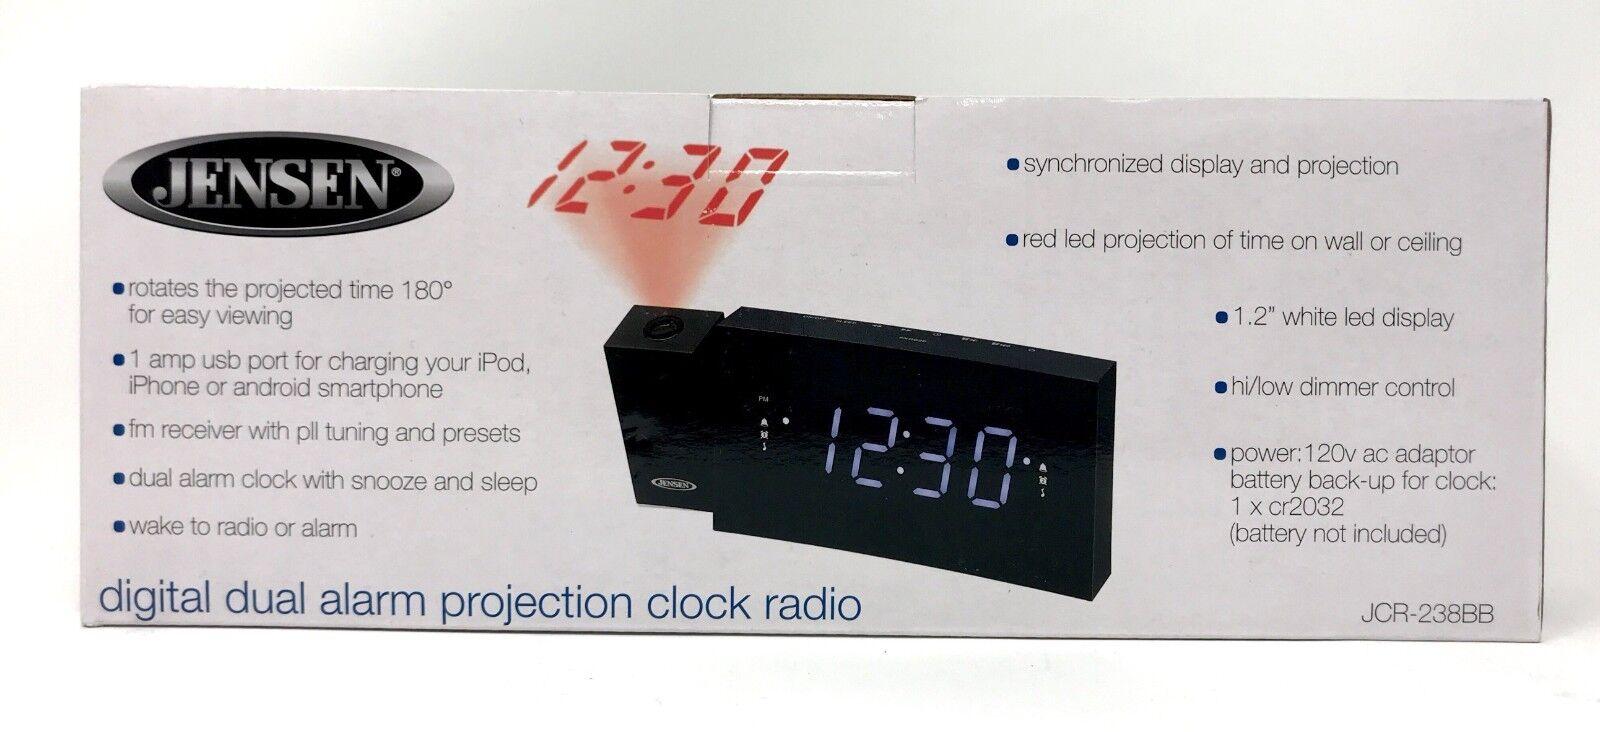 Jensen Dual Alarm Clock w/ FM Radio,USB Charging & Time Projection LED Display